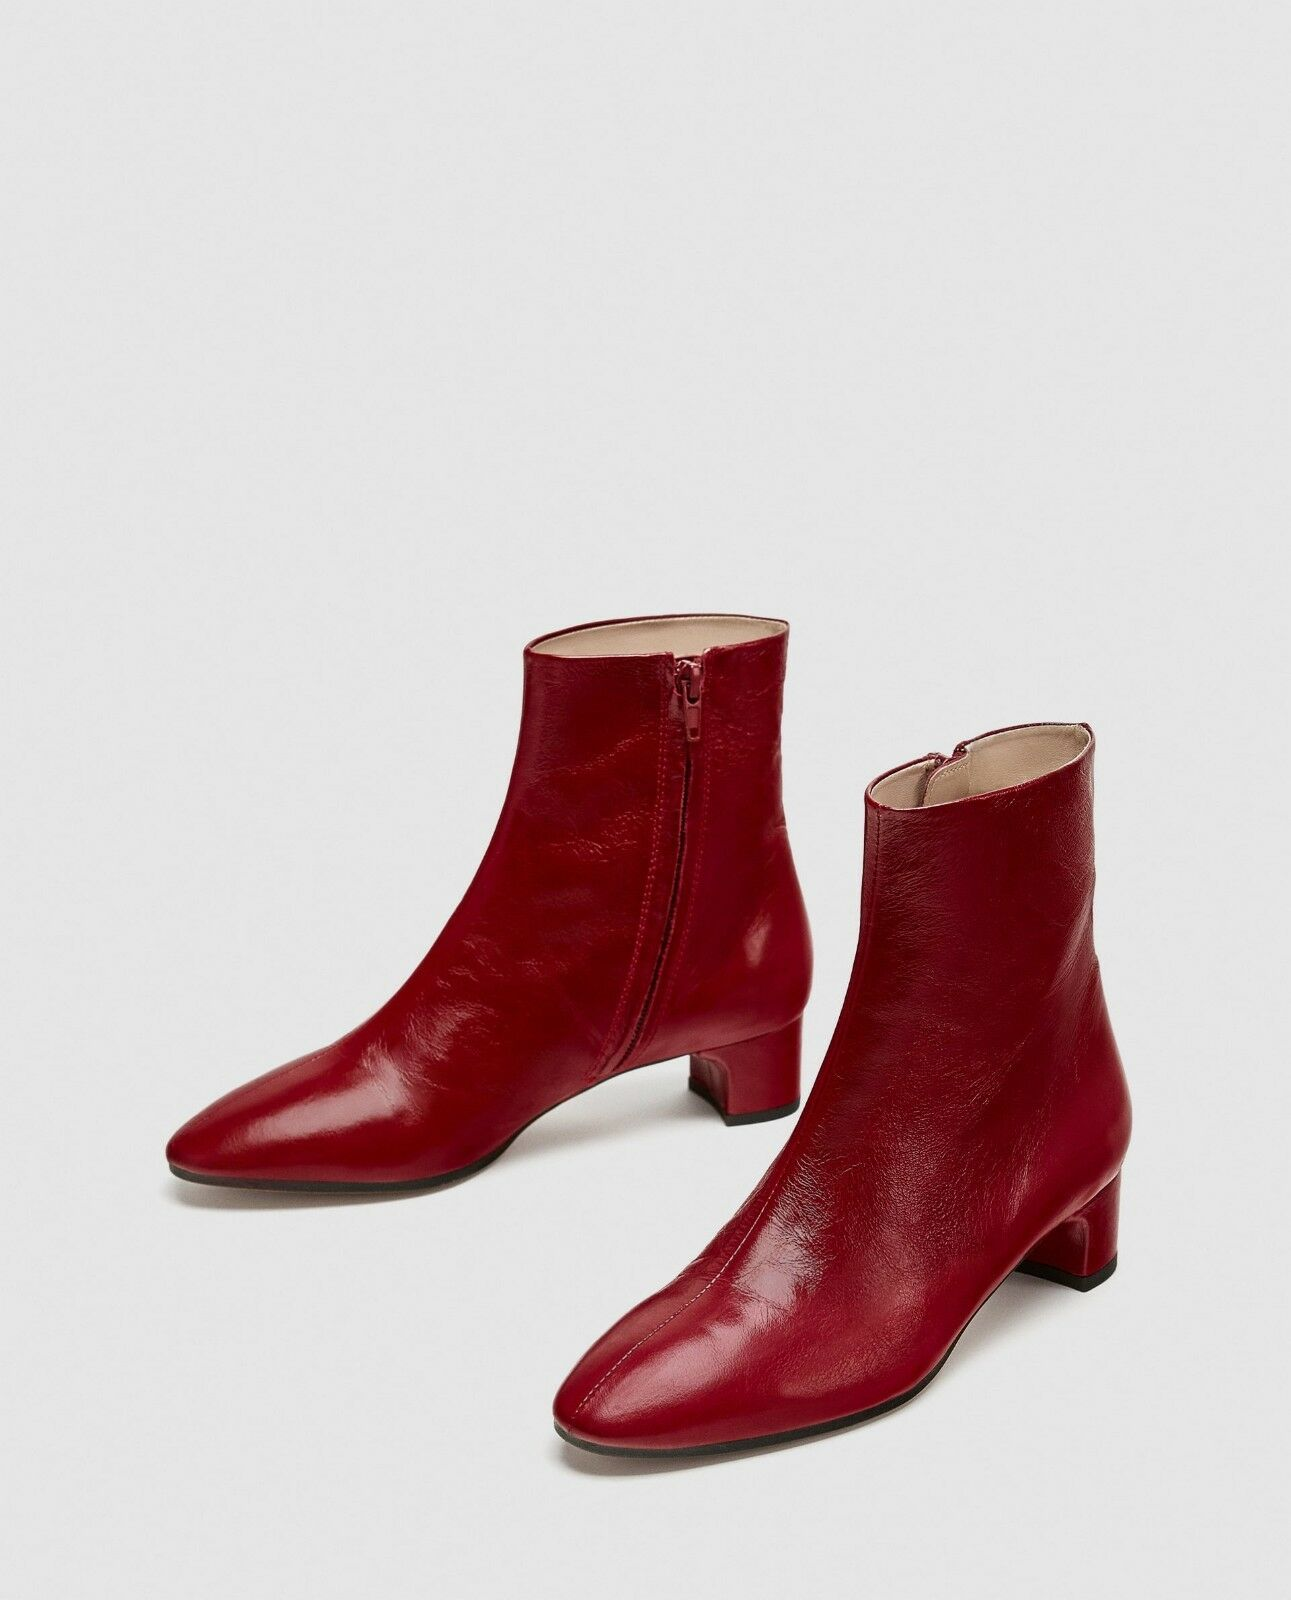 NEW Zara 100% Leder Ankle Stiefel, NEW ROT Stiefel, Block US, Heel // Größe 6 US, Block 36 EU 339dca